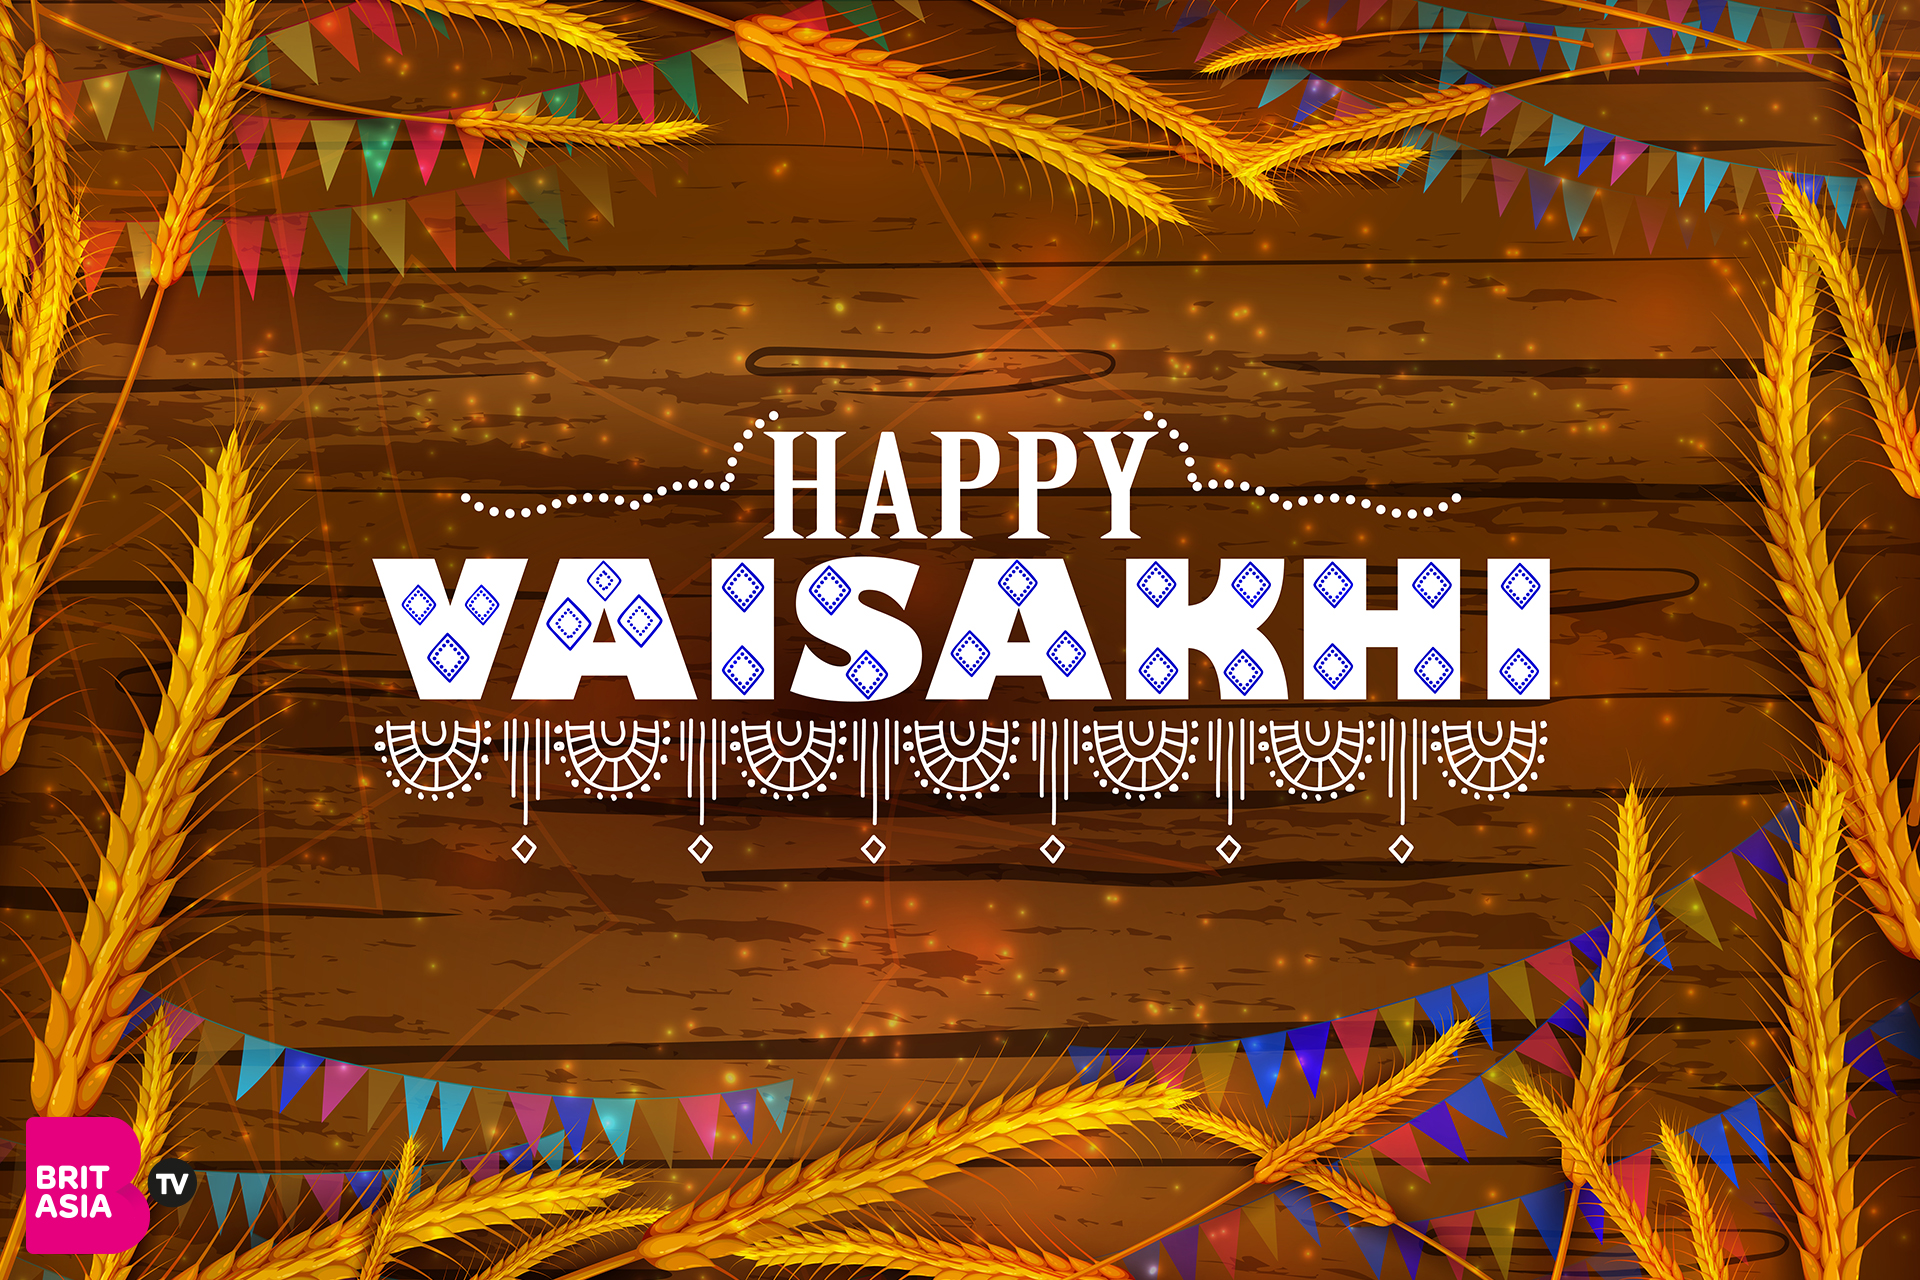 WHAT IS VAISAKHI? - BritAsia TV